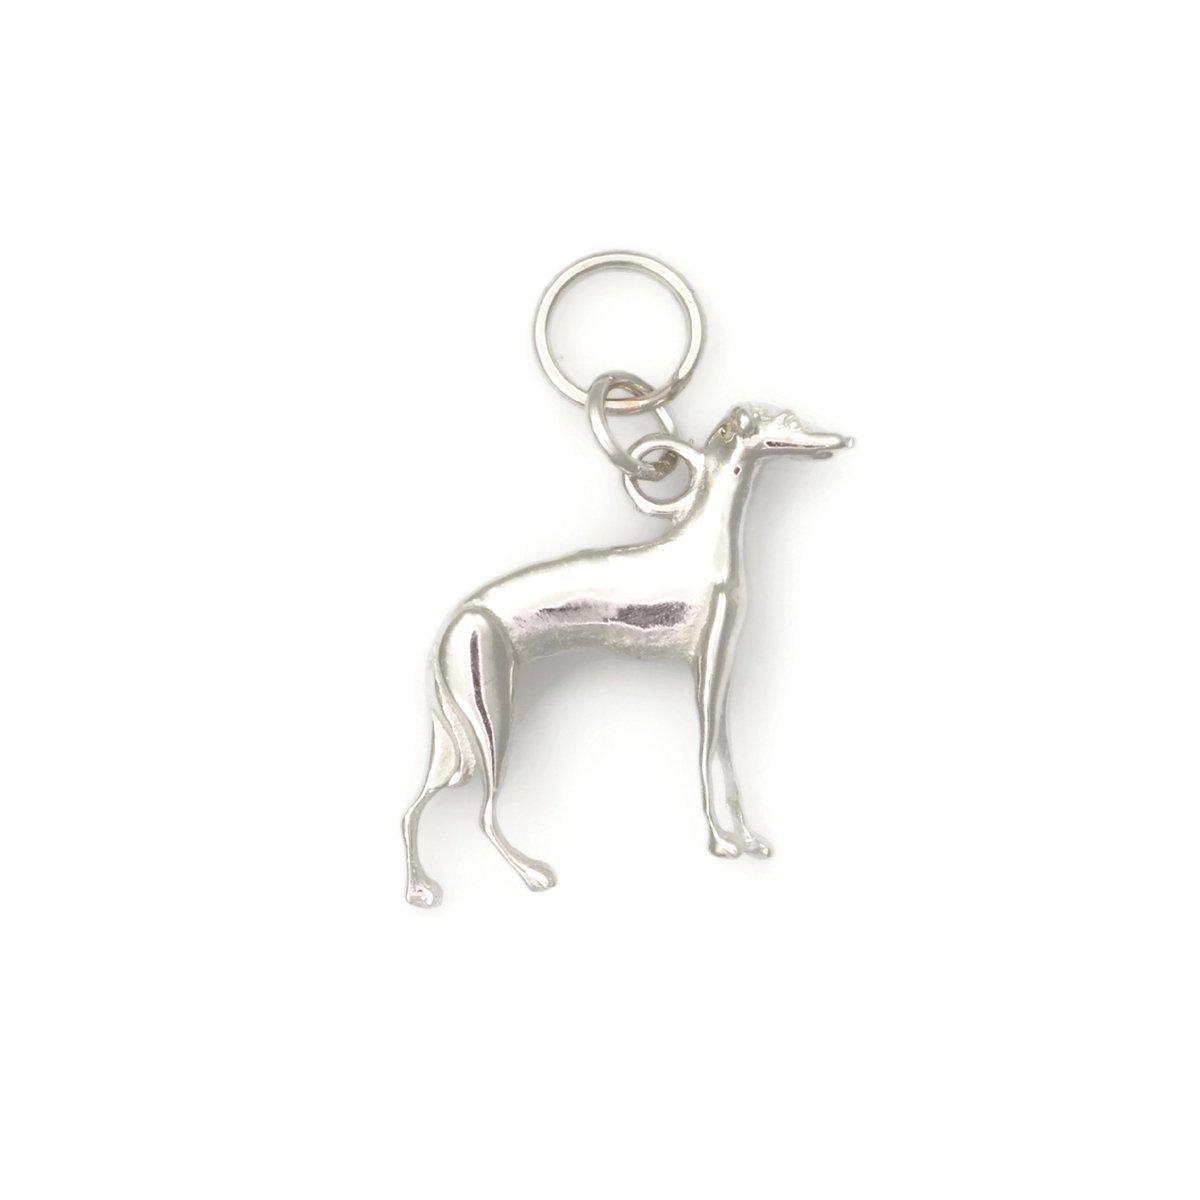 Donna Pizarro Designs 14kt White Gold Italian Greyhound Charm 4clG3Bm8nz